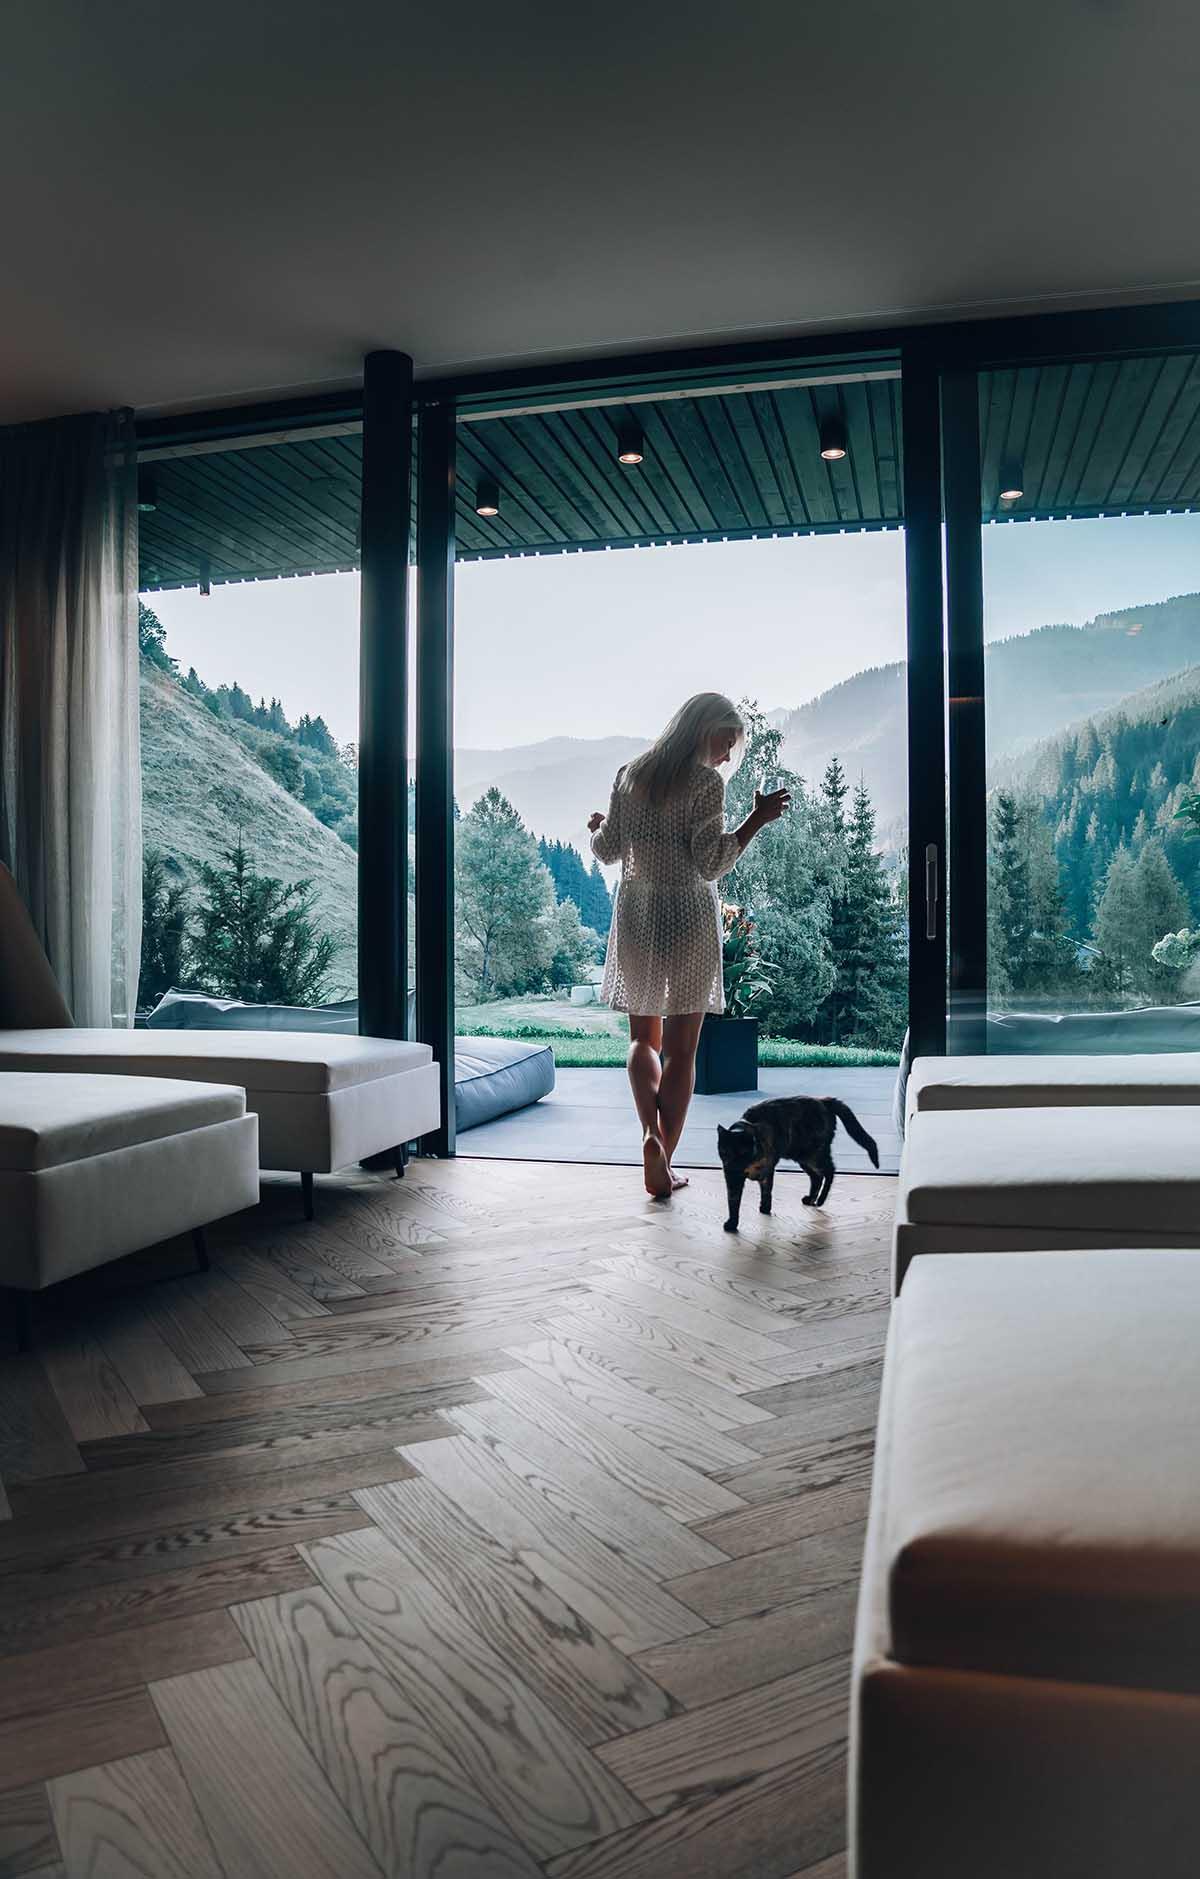 goldstueck-boutique-hotel-saalbach-hinterglemm-wellness